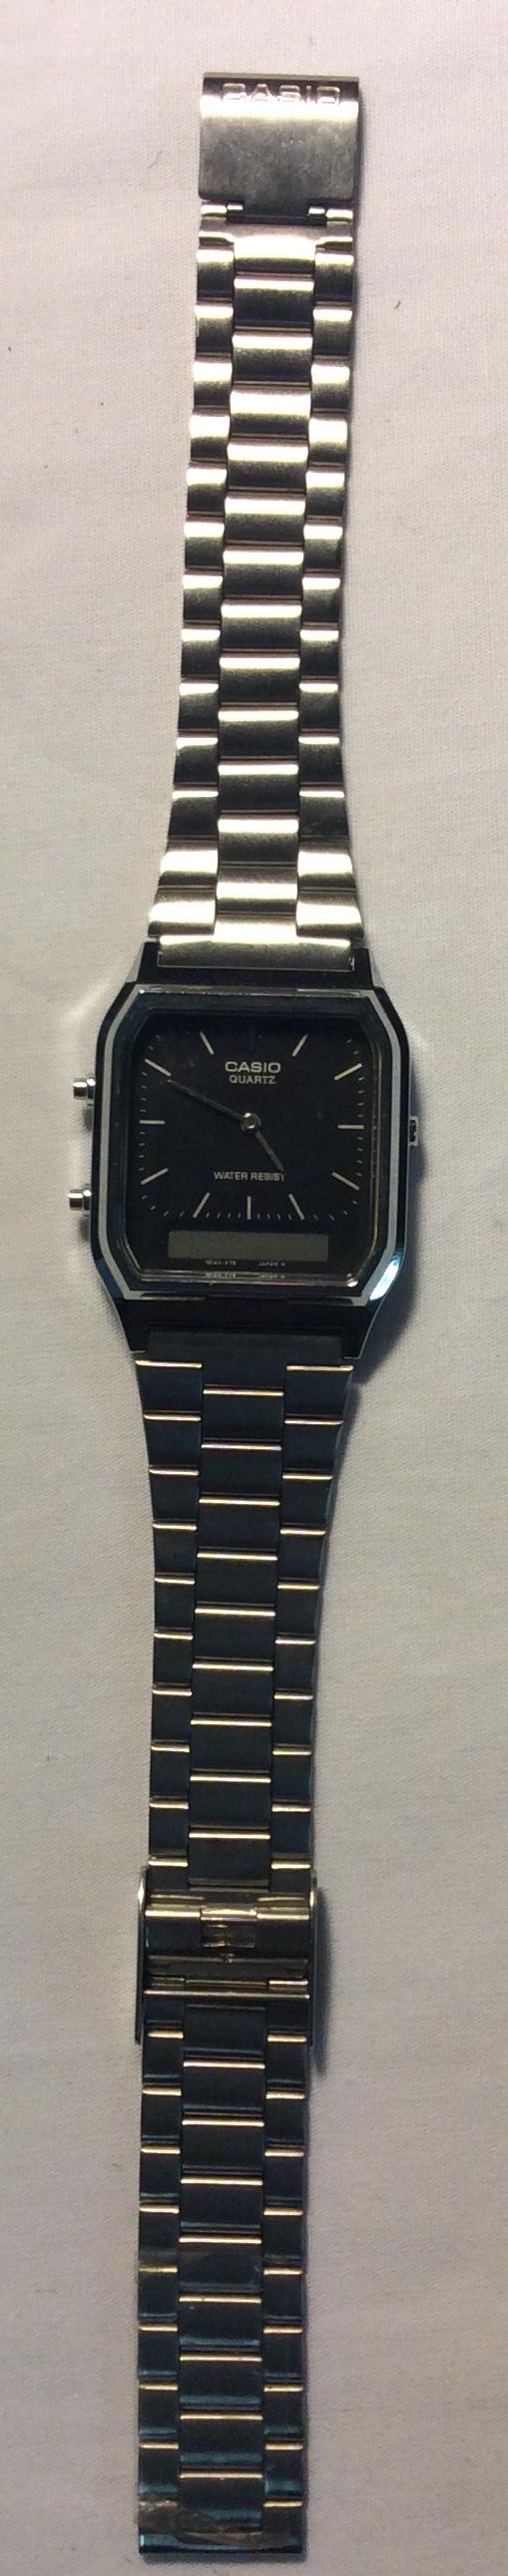 Casio watch - Black square face